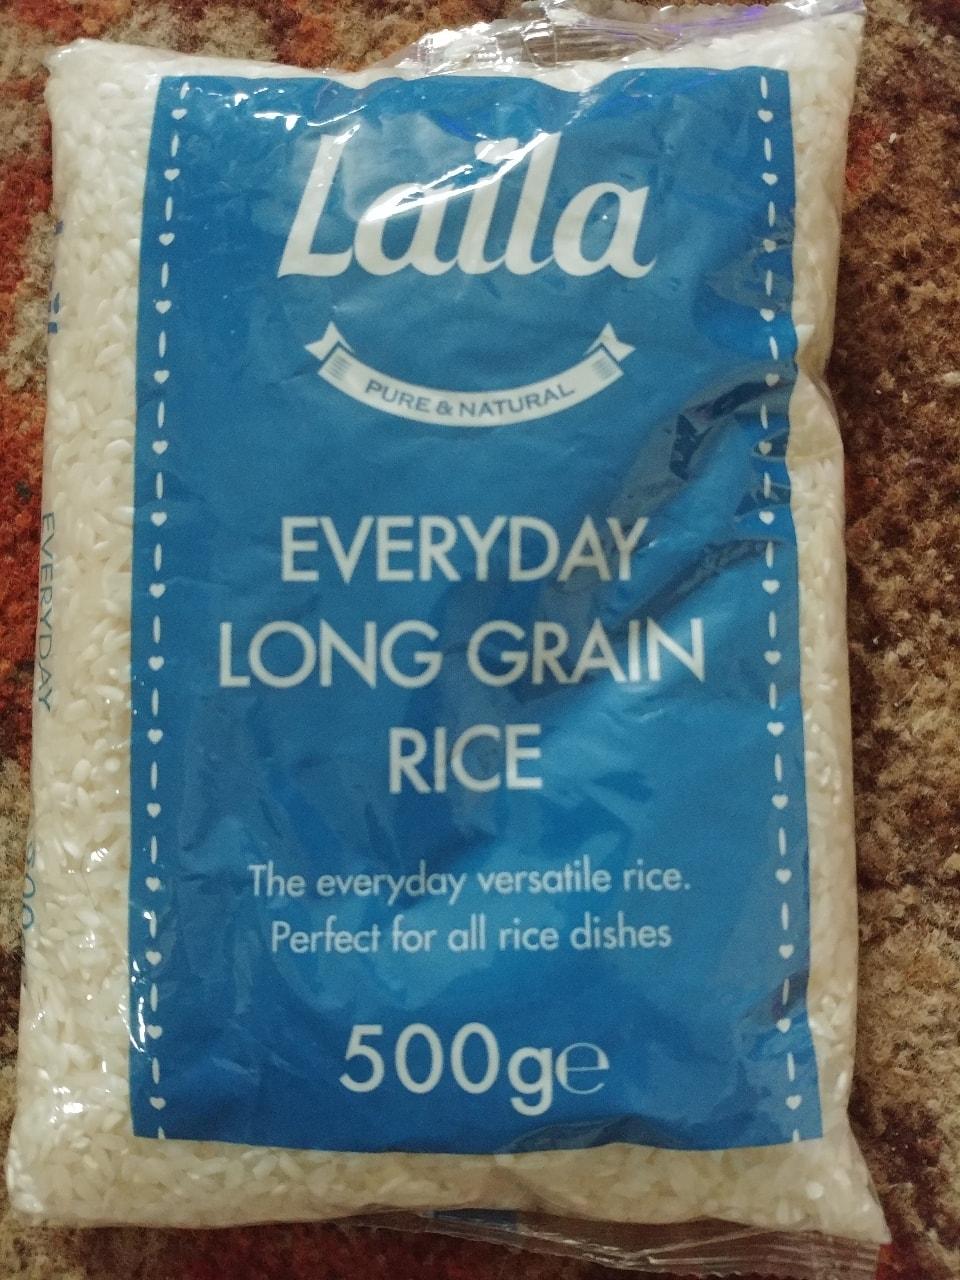 Laila everyday long grain rice